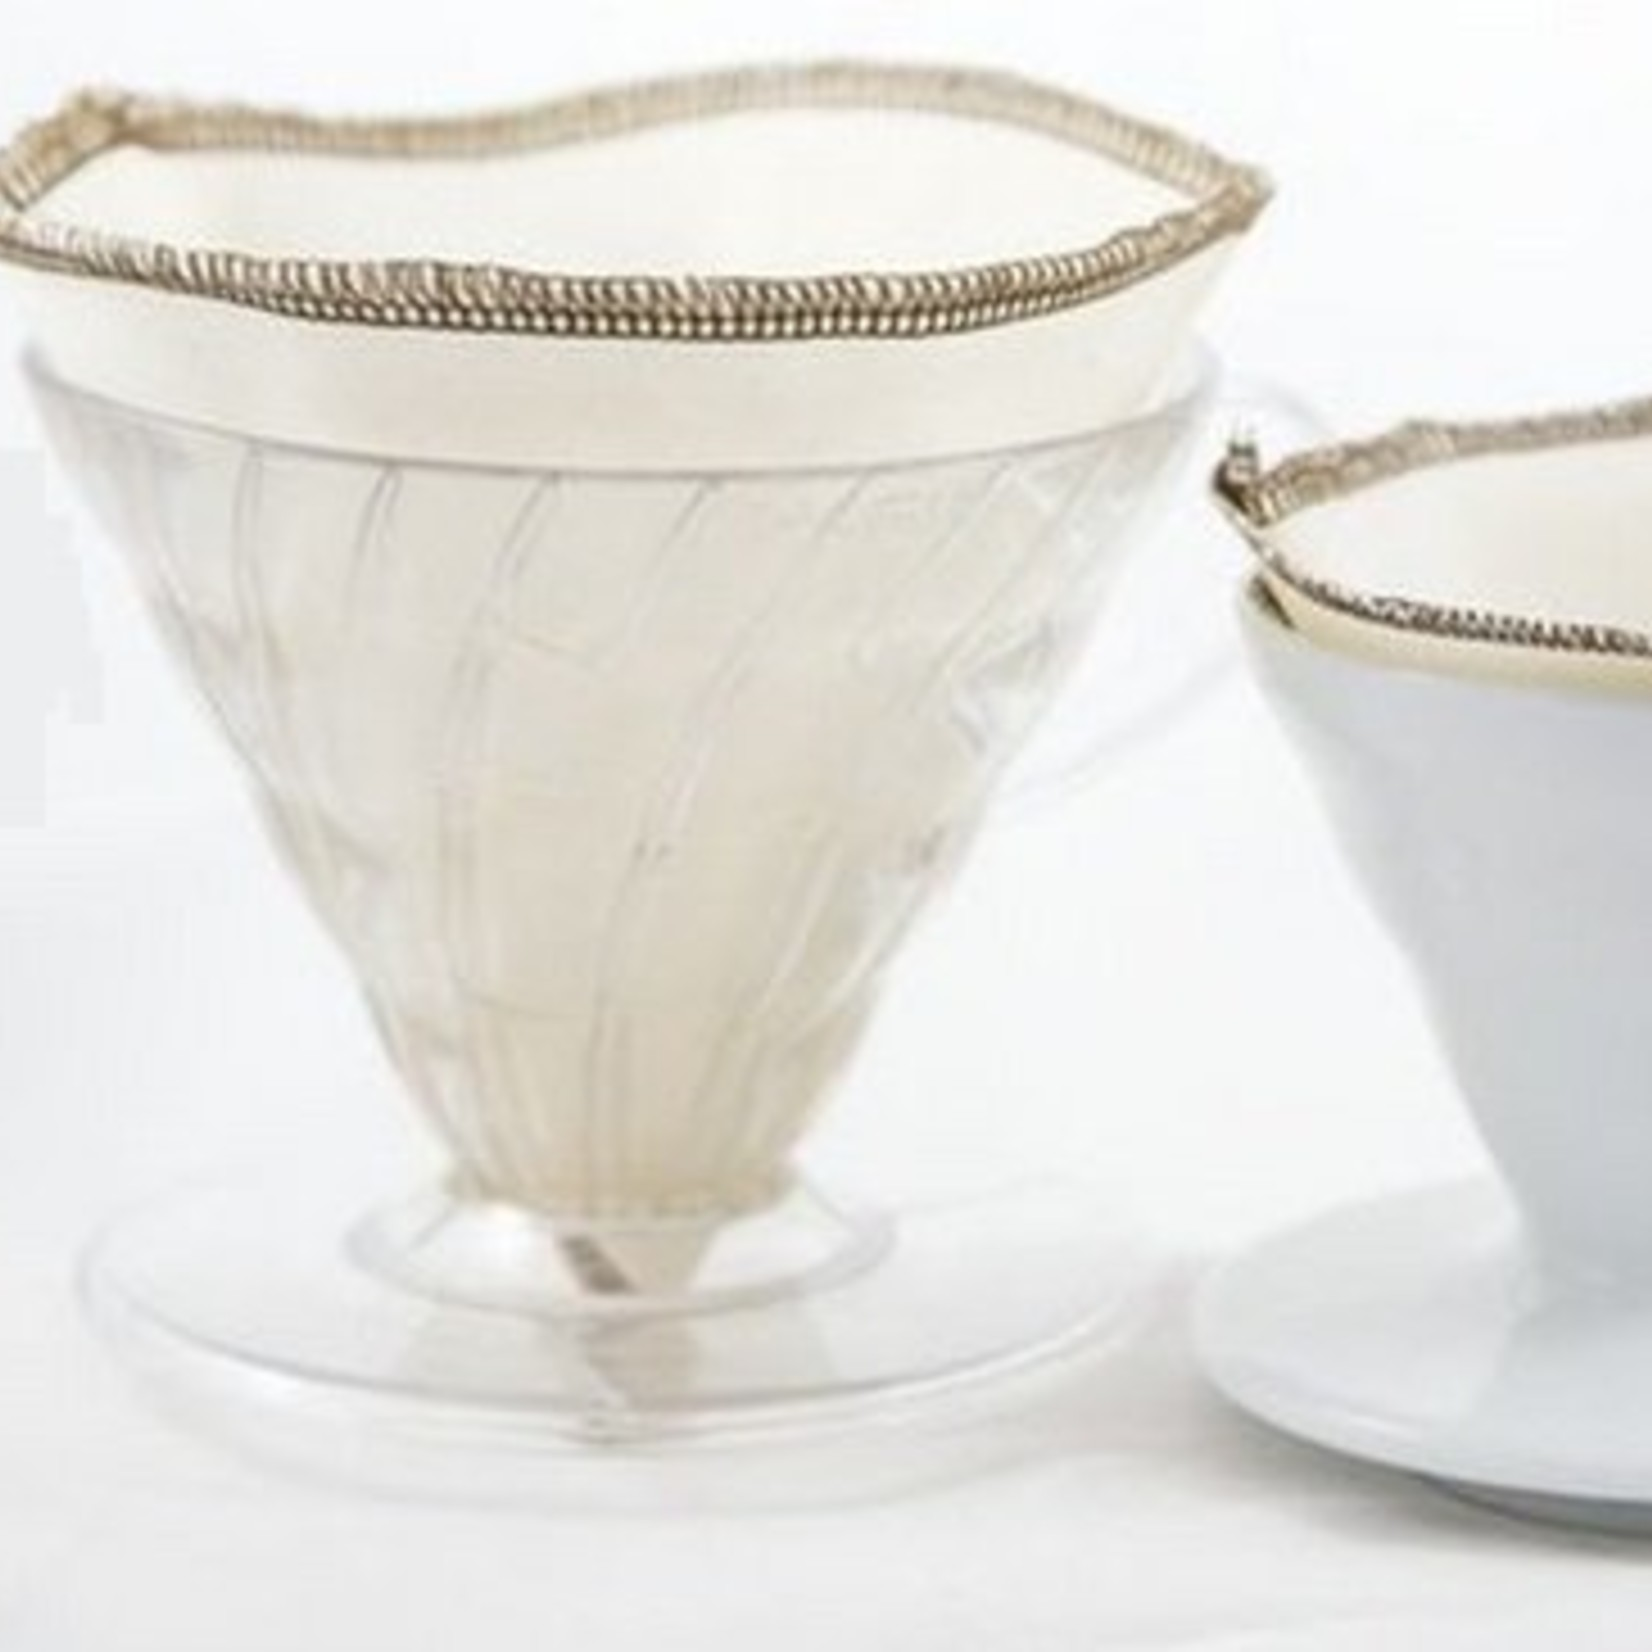 Katoenen herbruikbare koffiefilter (2)